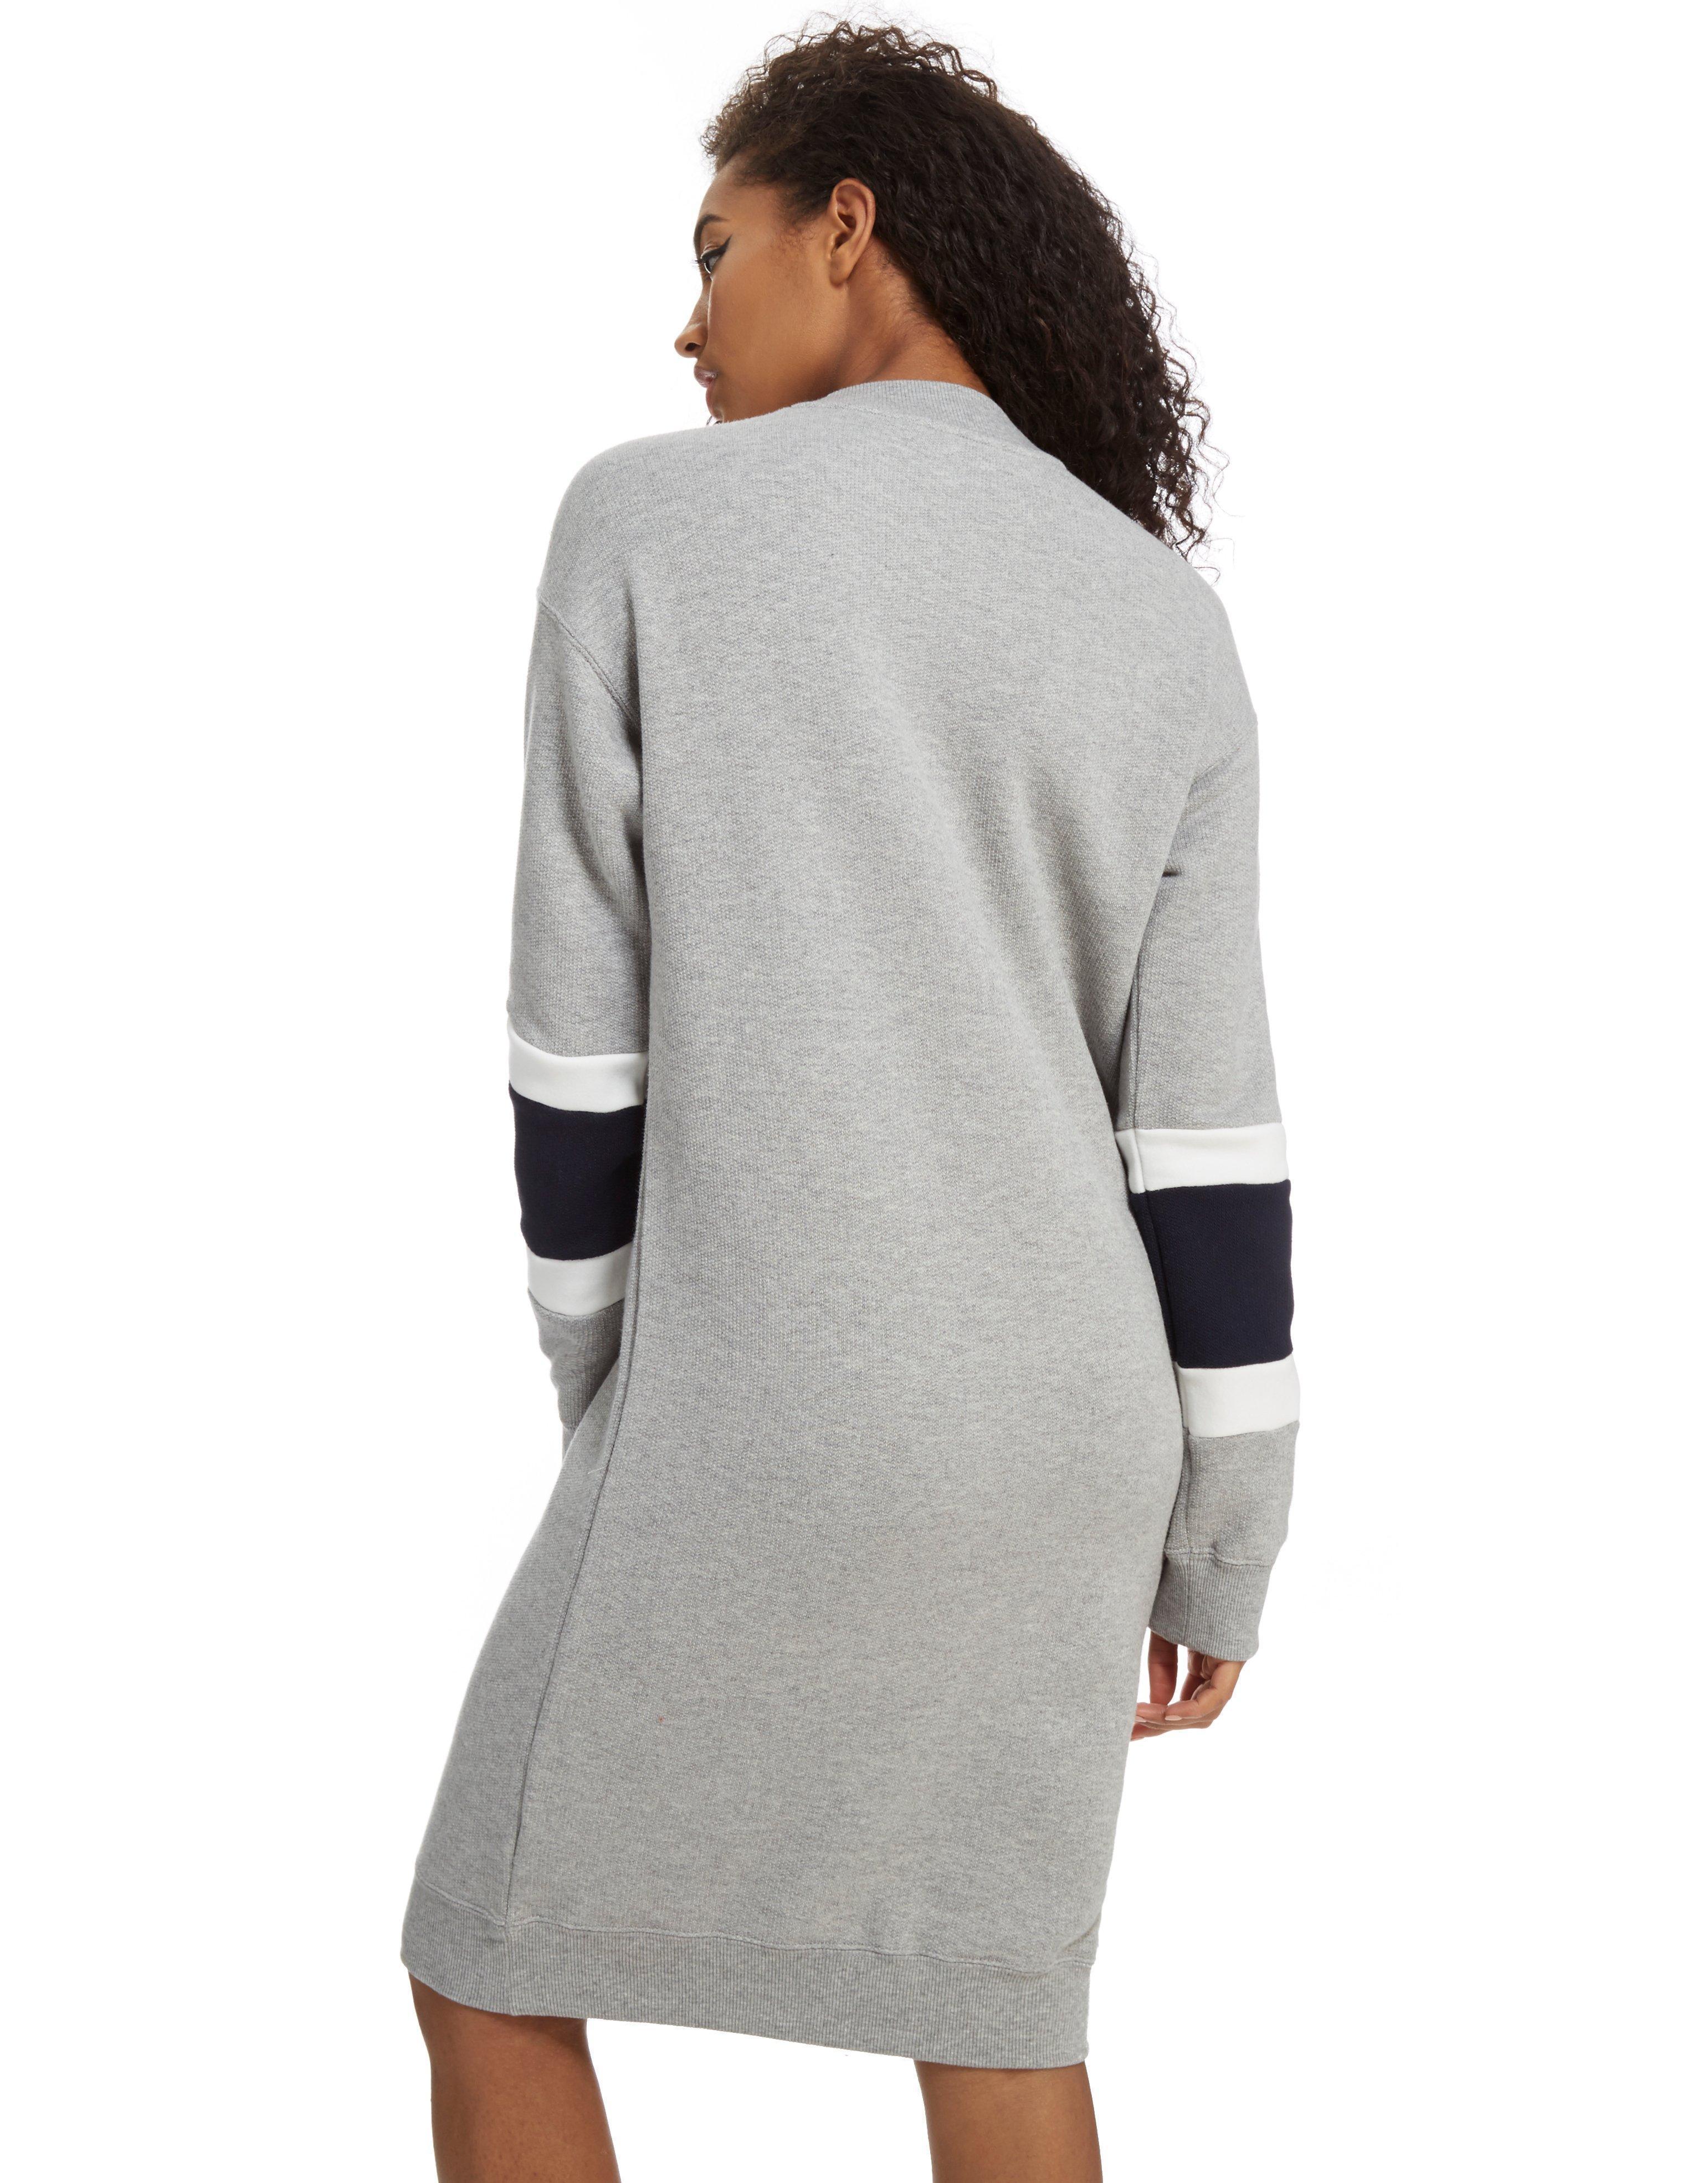 Adidas Originals High Neck Sweater Dress In Gray Lyst